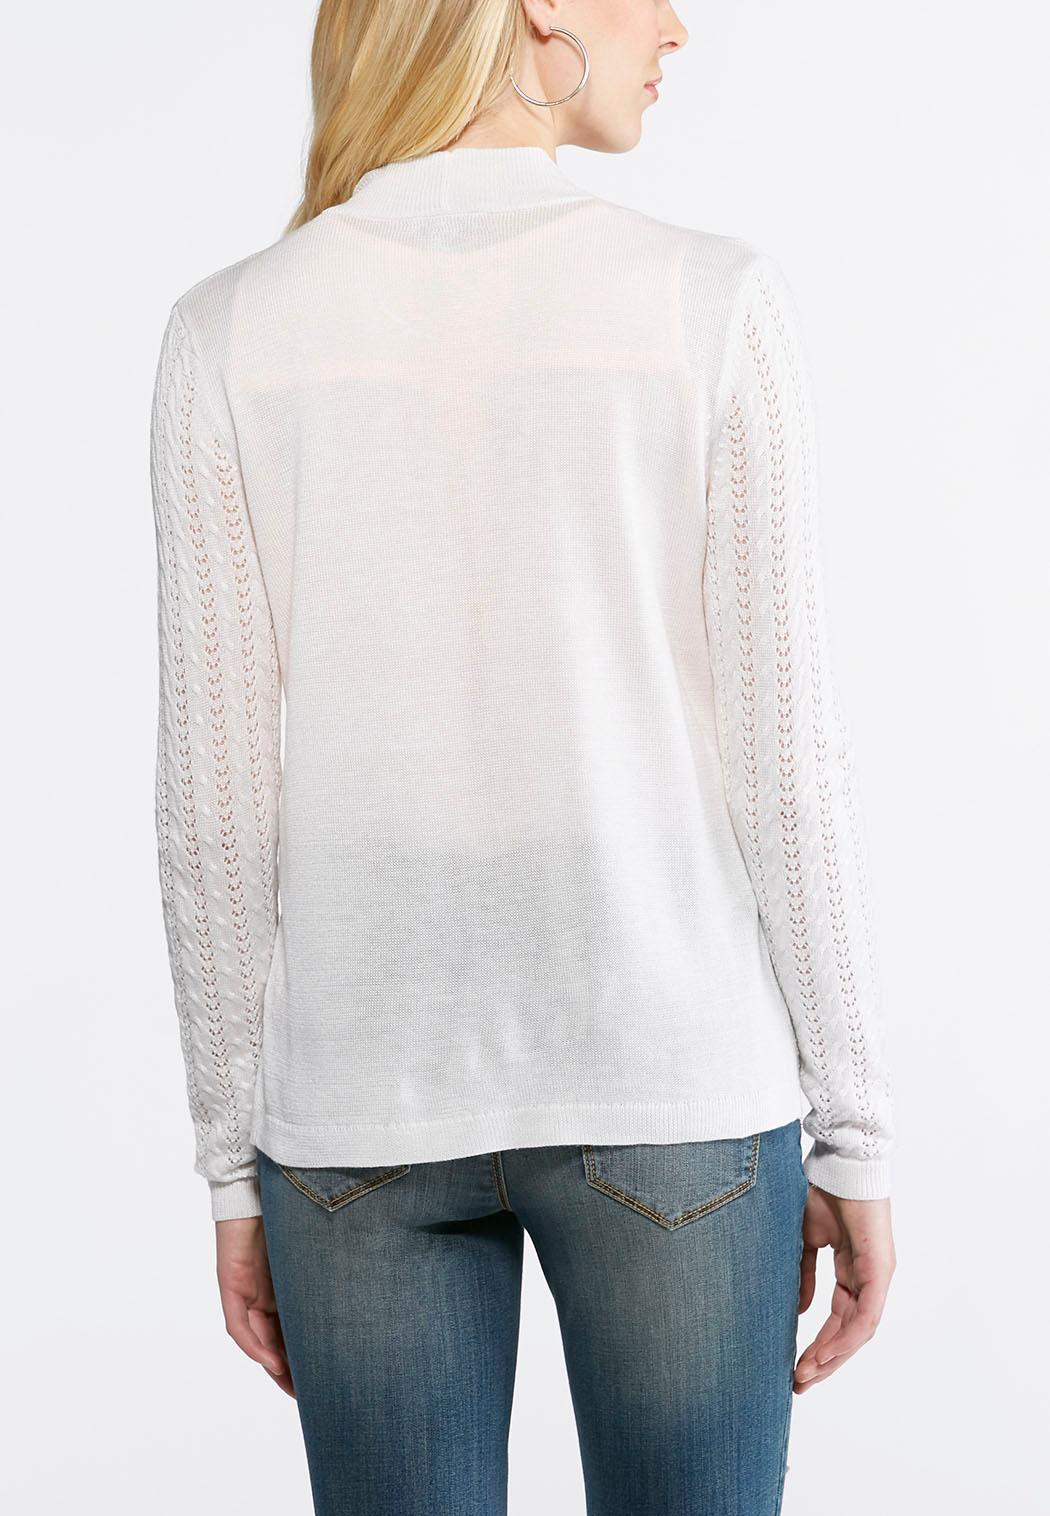 Waterfall Cardigan Sweater-Plus Cardigans & Shrugs Cato Fashions